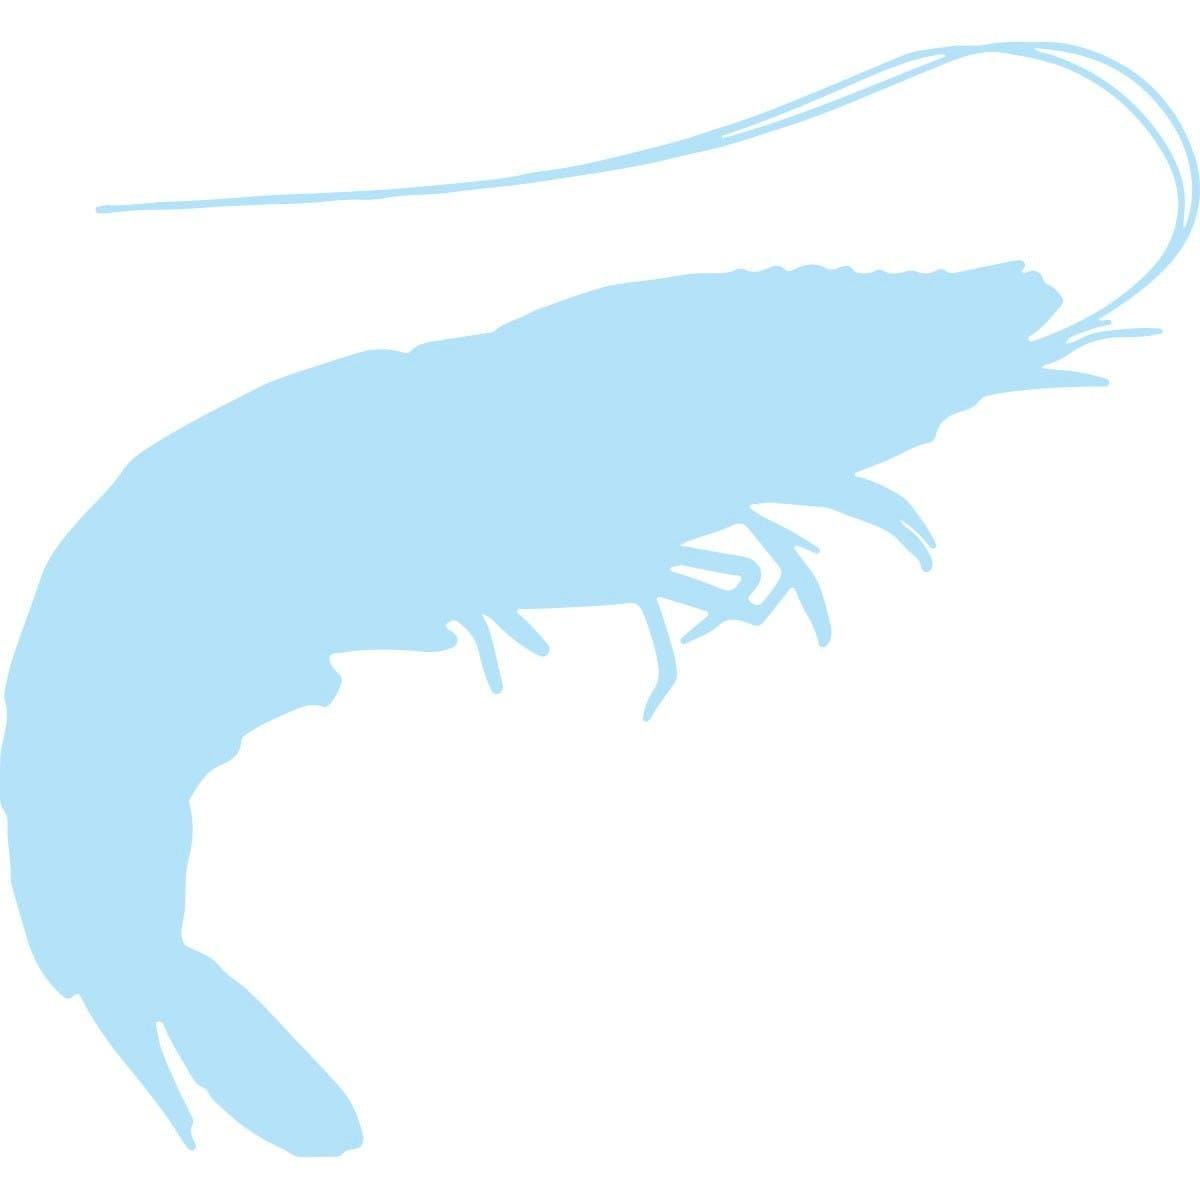 Shrimp Image - 1